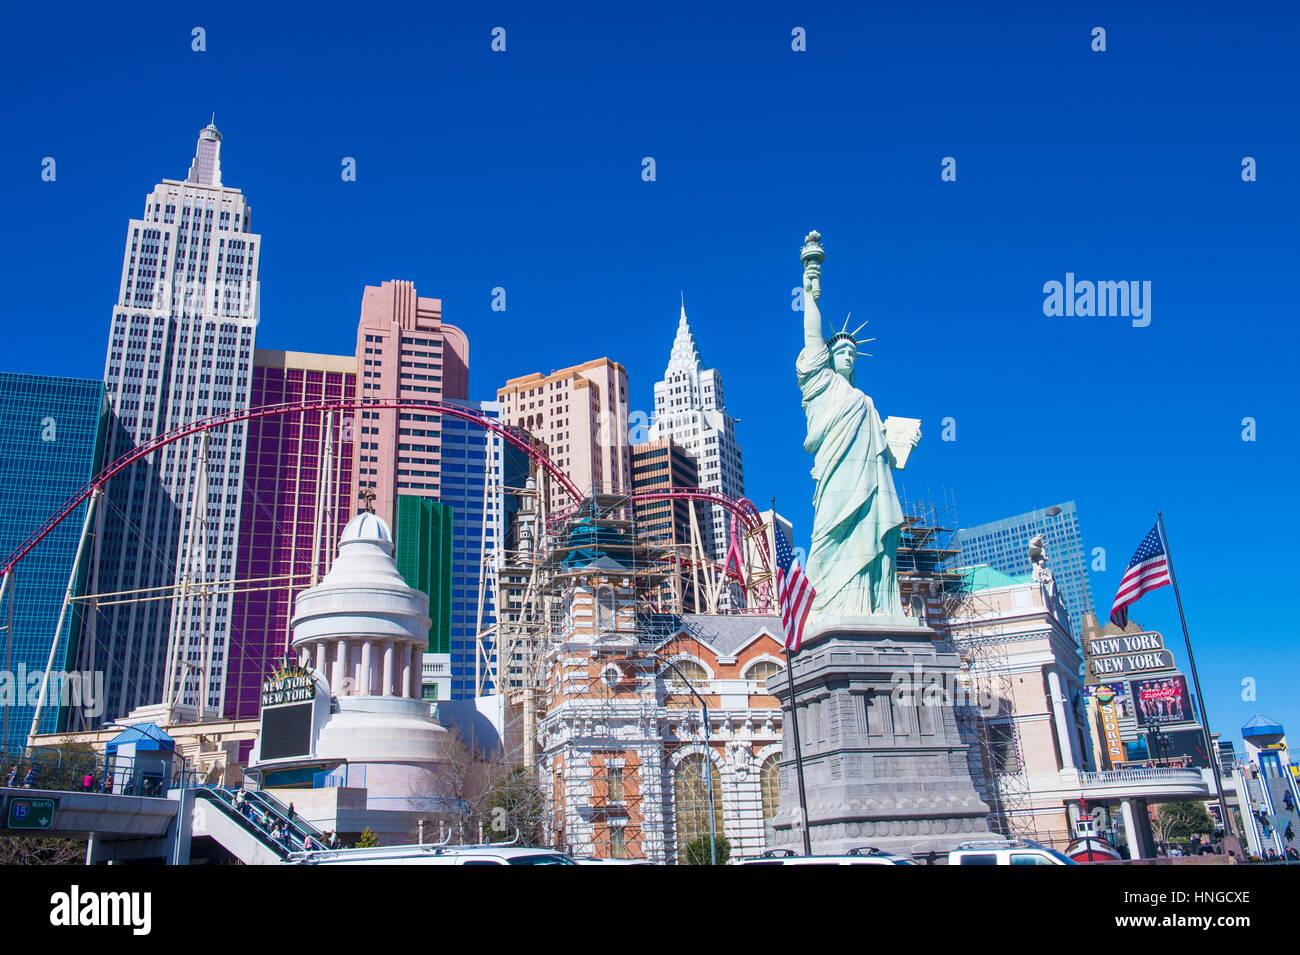 Großartig Skyline Hotel New York Hölle Küche Fotos - Küche Set Ideen ...